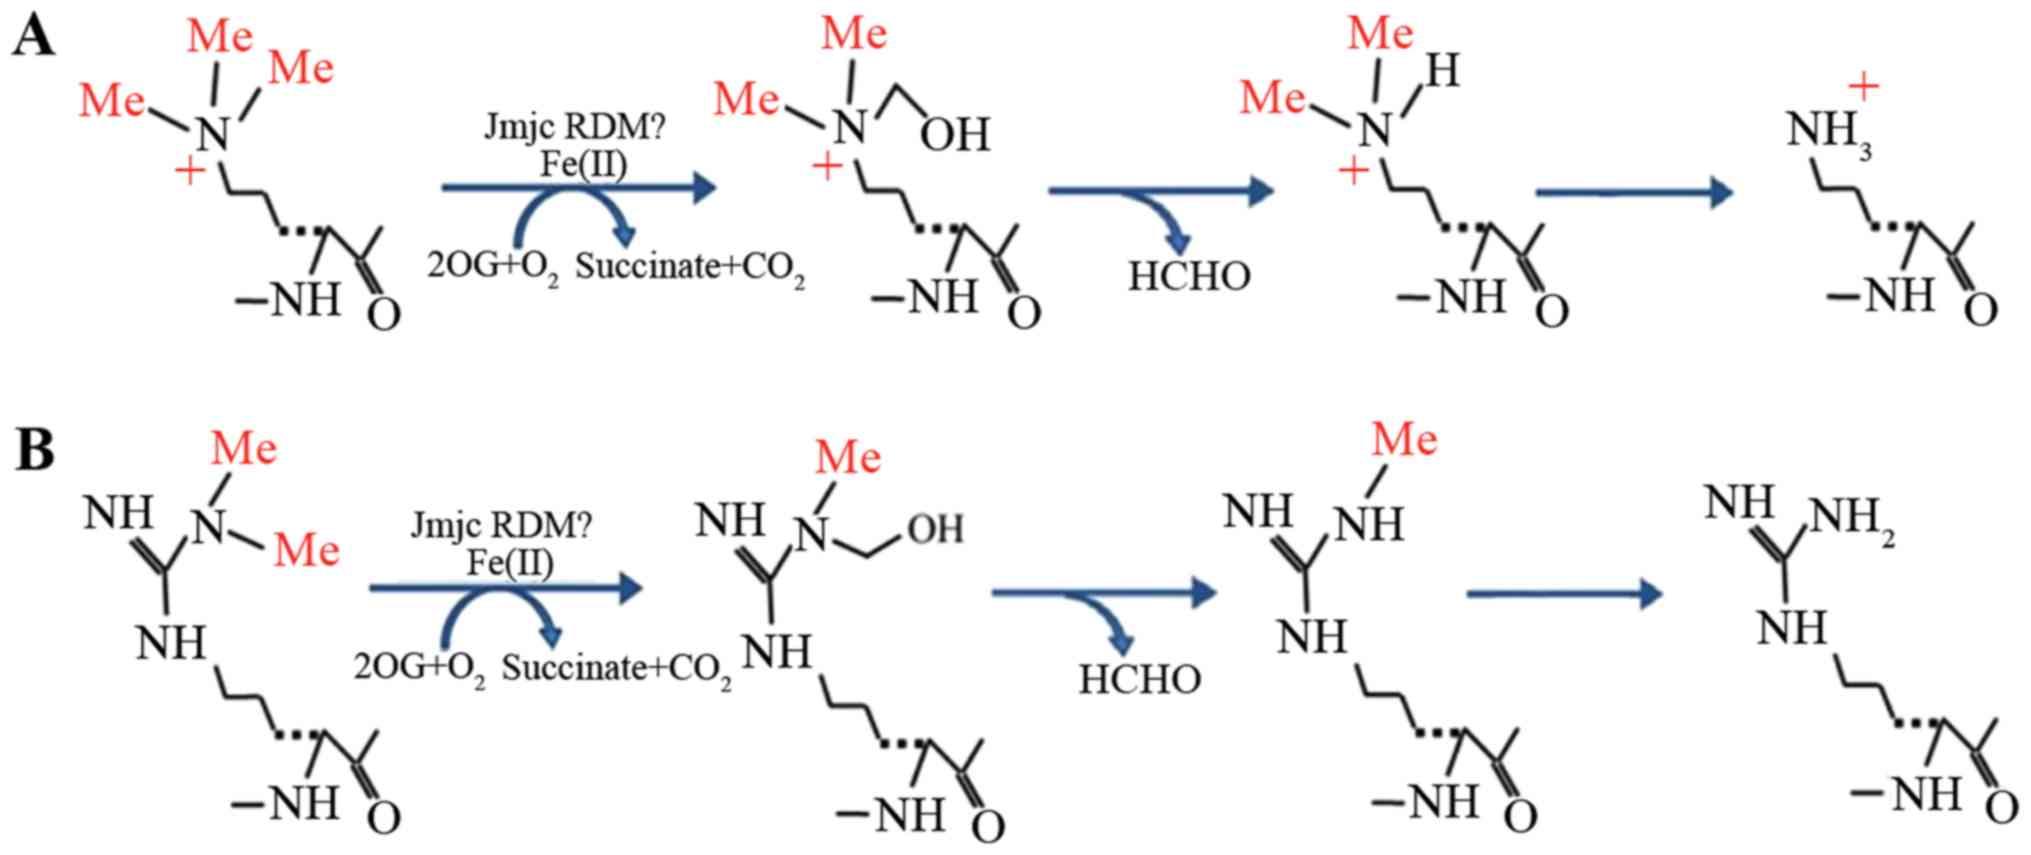 Regulation of histone arginine methylation/demethylation by